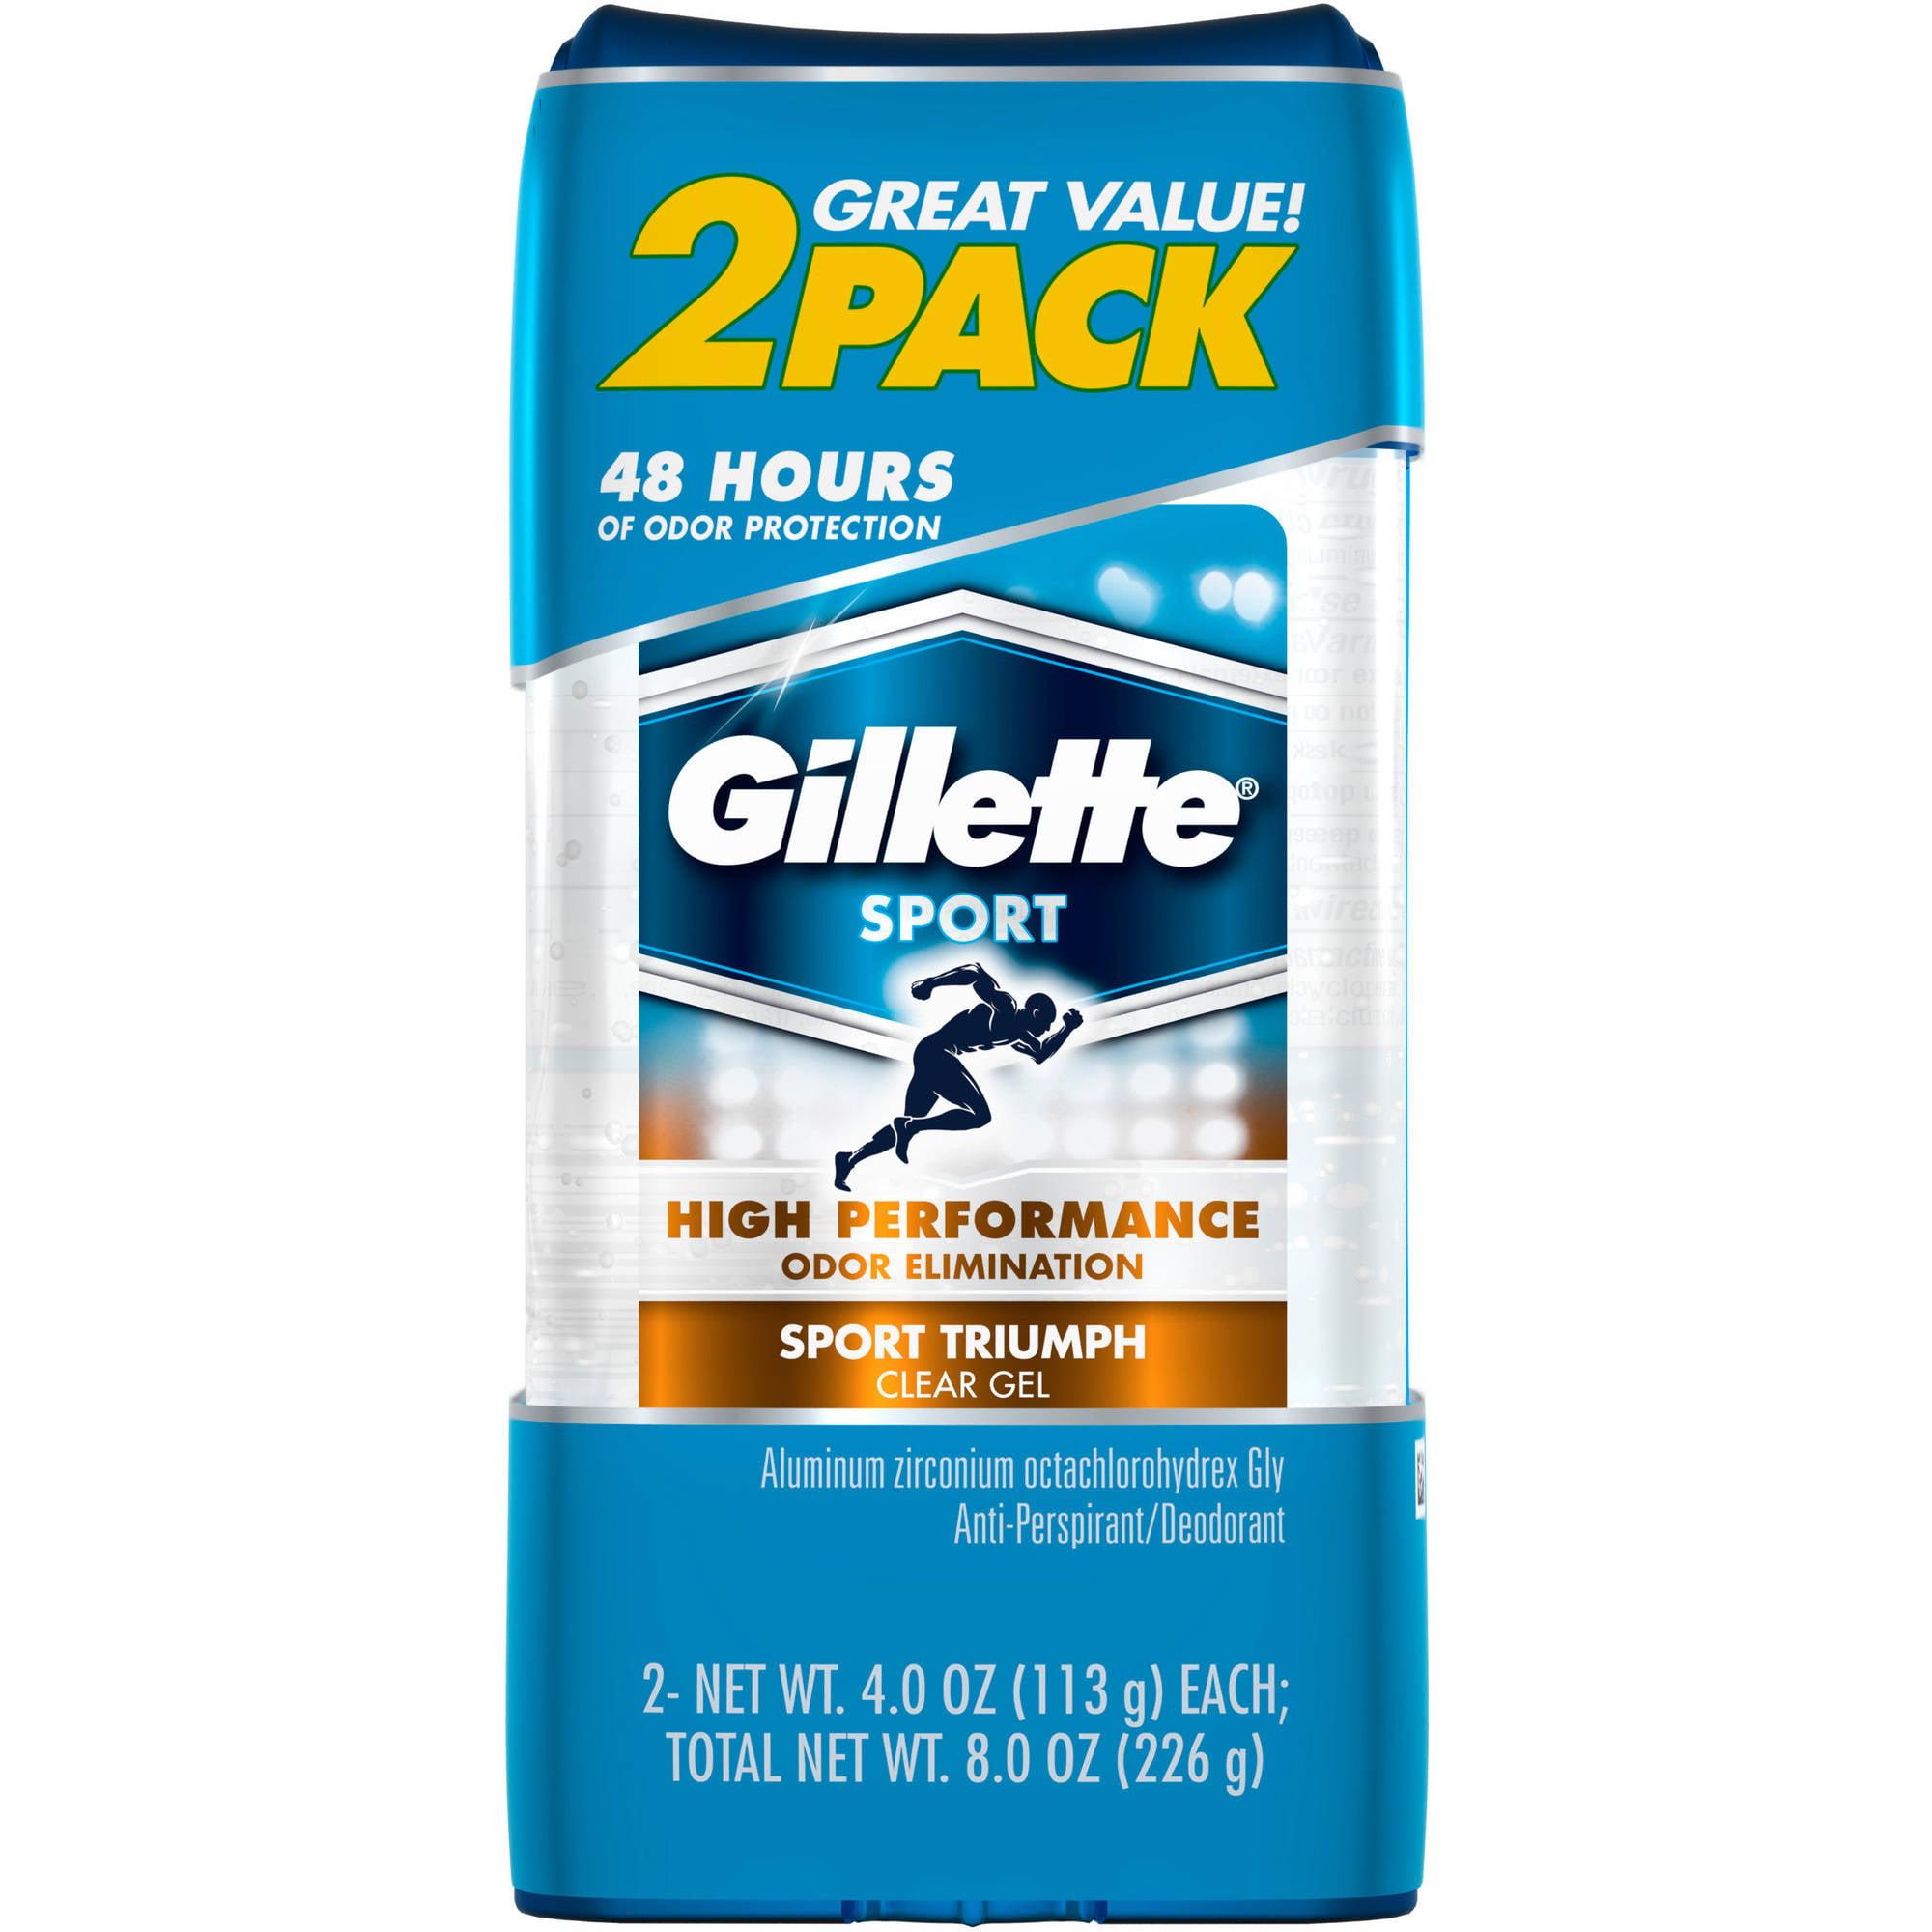 Gillette Clear & Refreshing Sport Gel Anti-Perspirant/Deodorant, 4 oz, 2 count